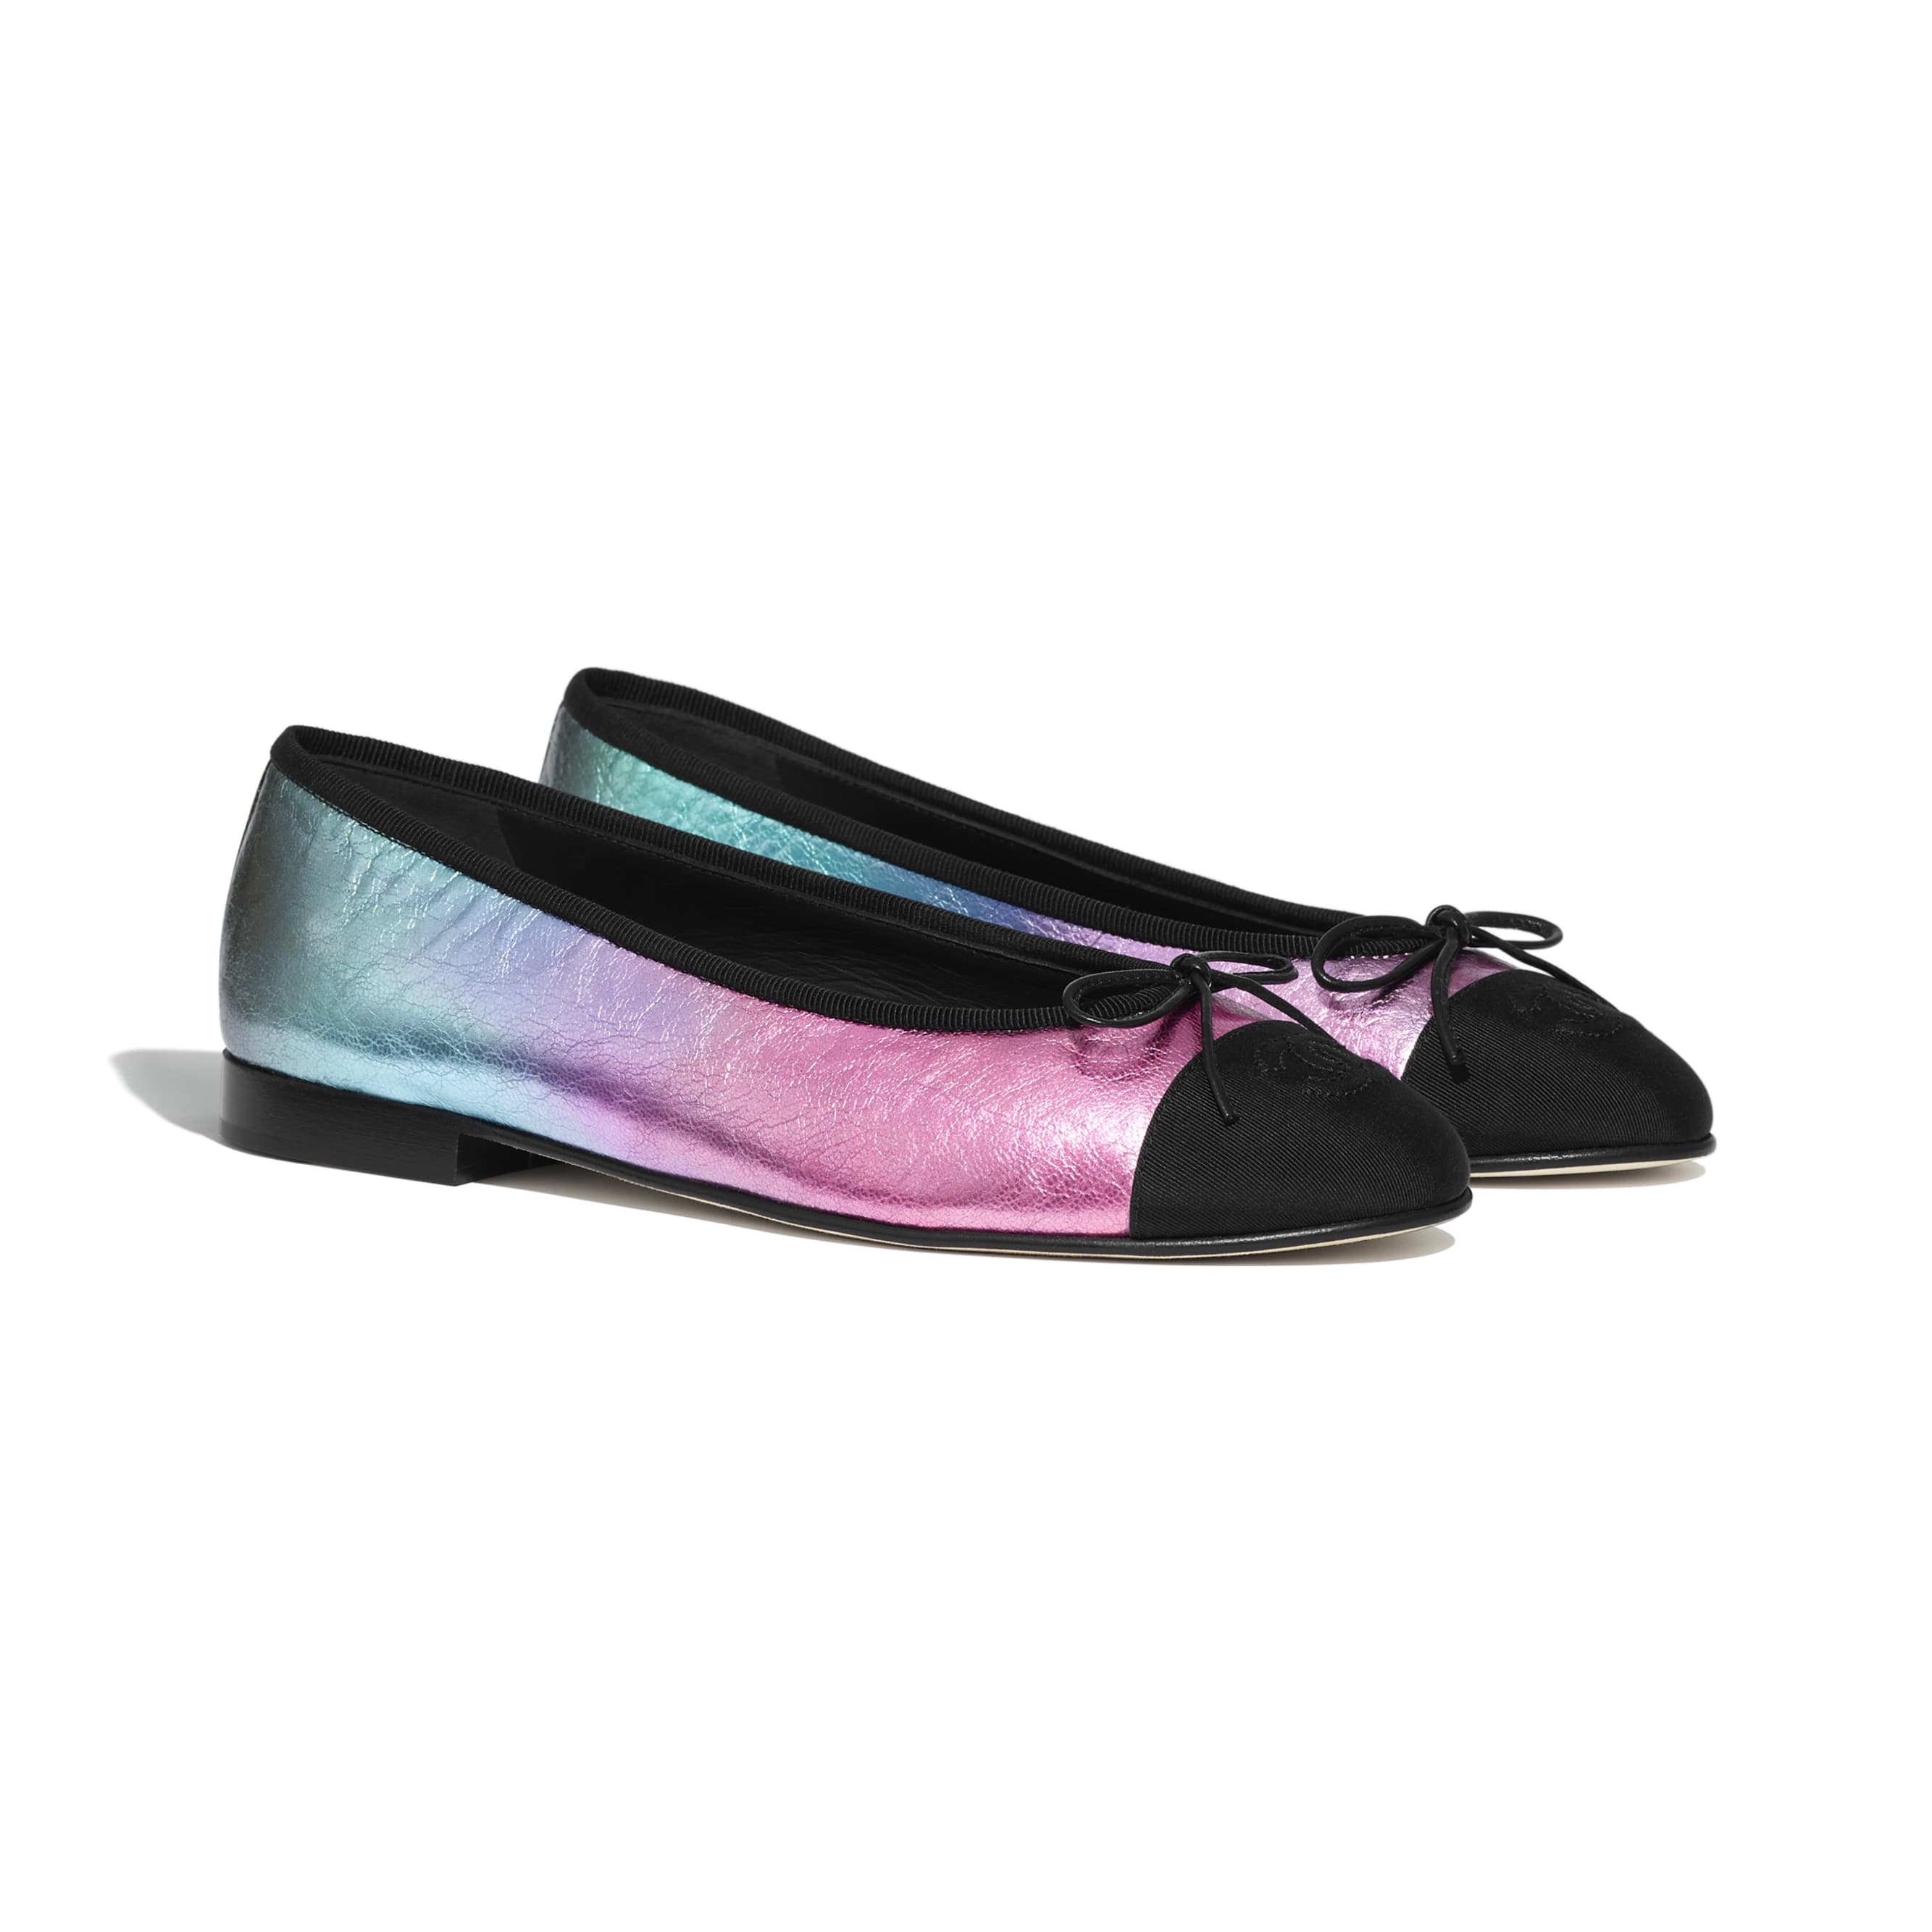 Flats - Multicolor & Black - Laminated Calfskin & Grosgrain - CHANEL - Alternative view - see standard sized version